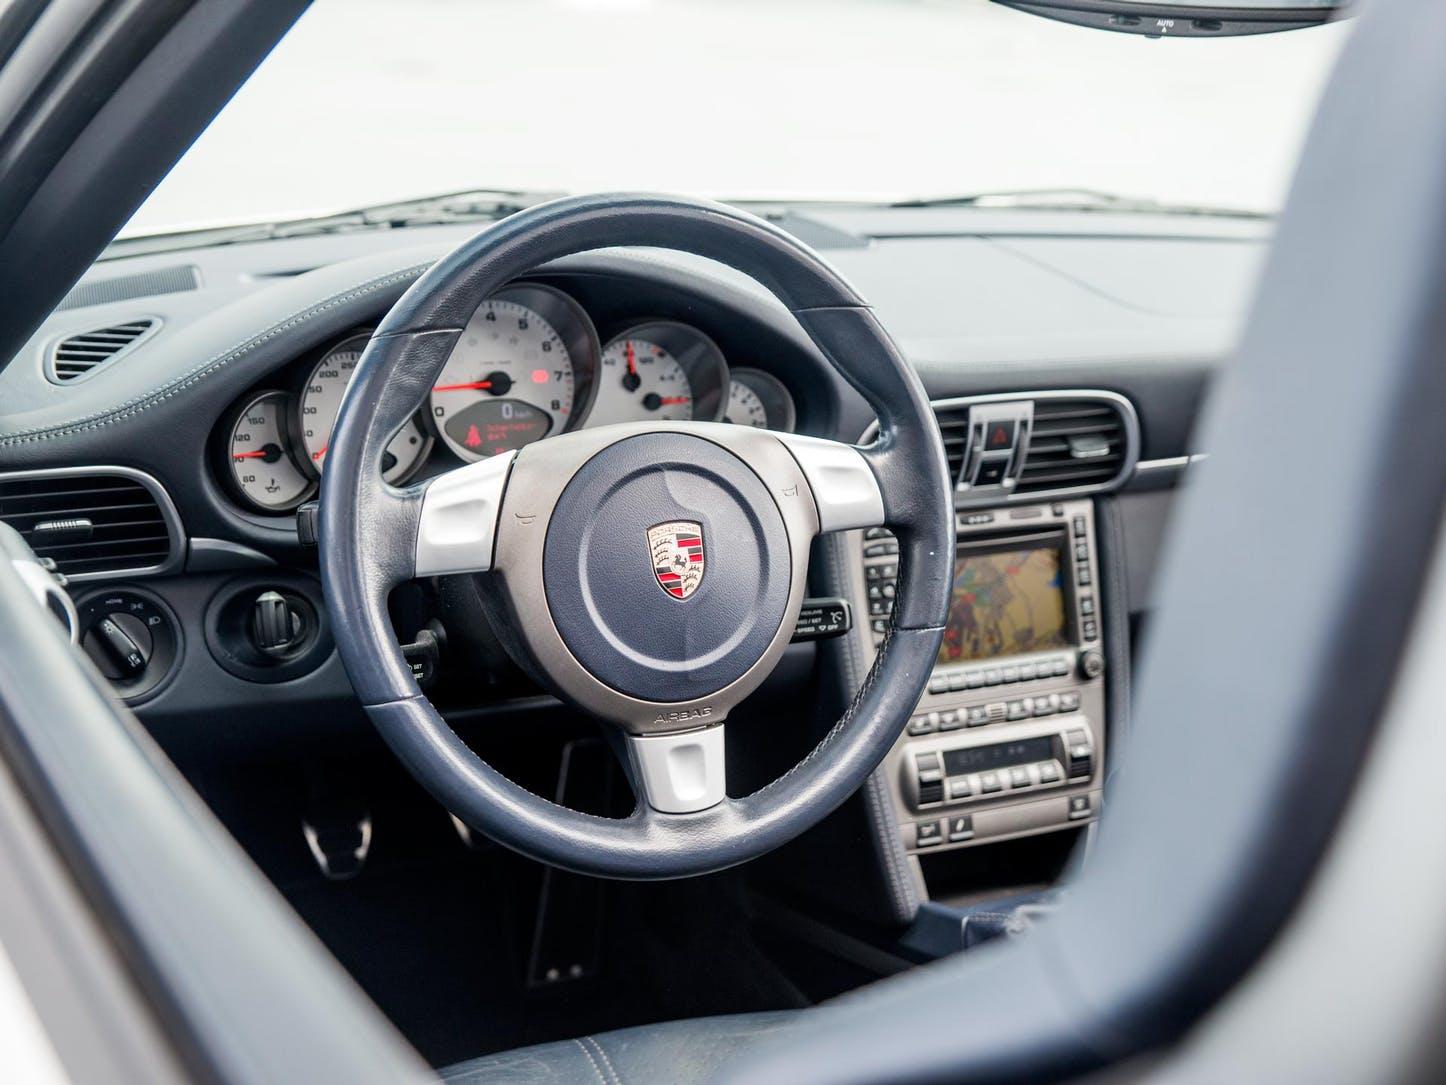 Tweedehands Porsche 911 Cabrio 2007 occasion